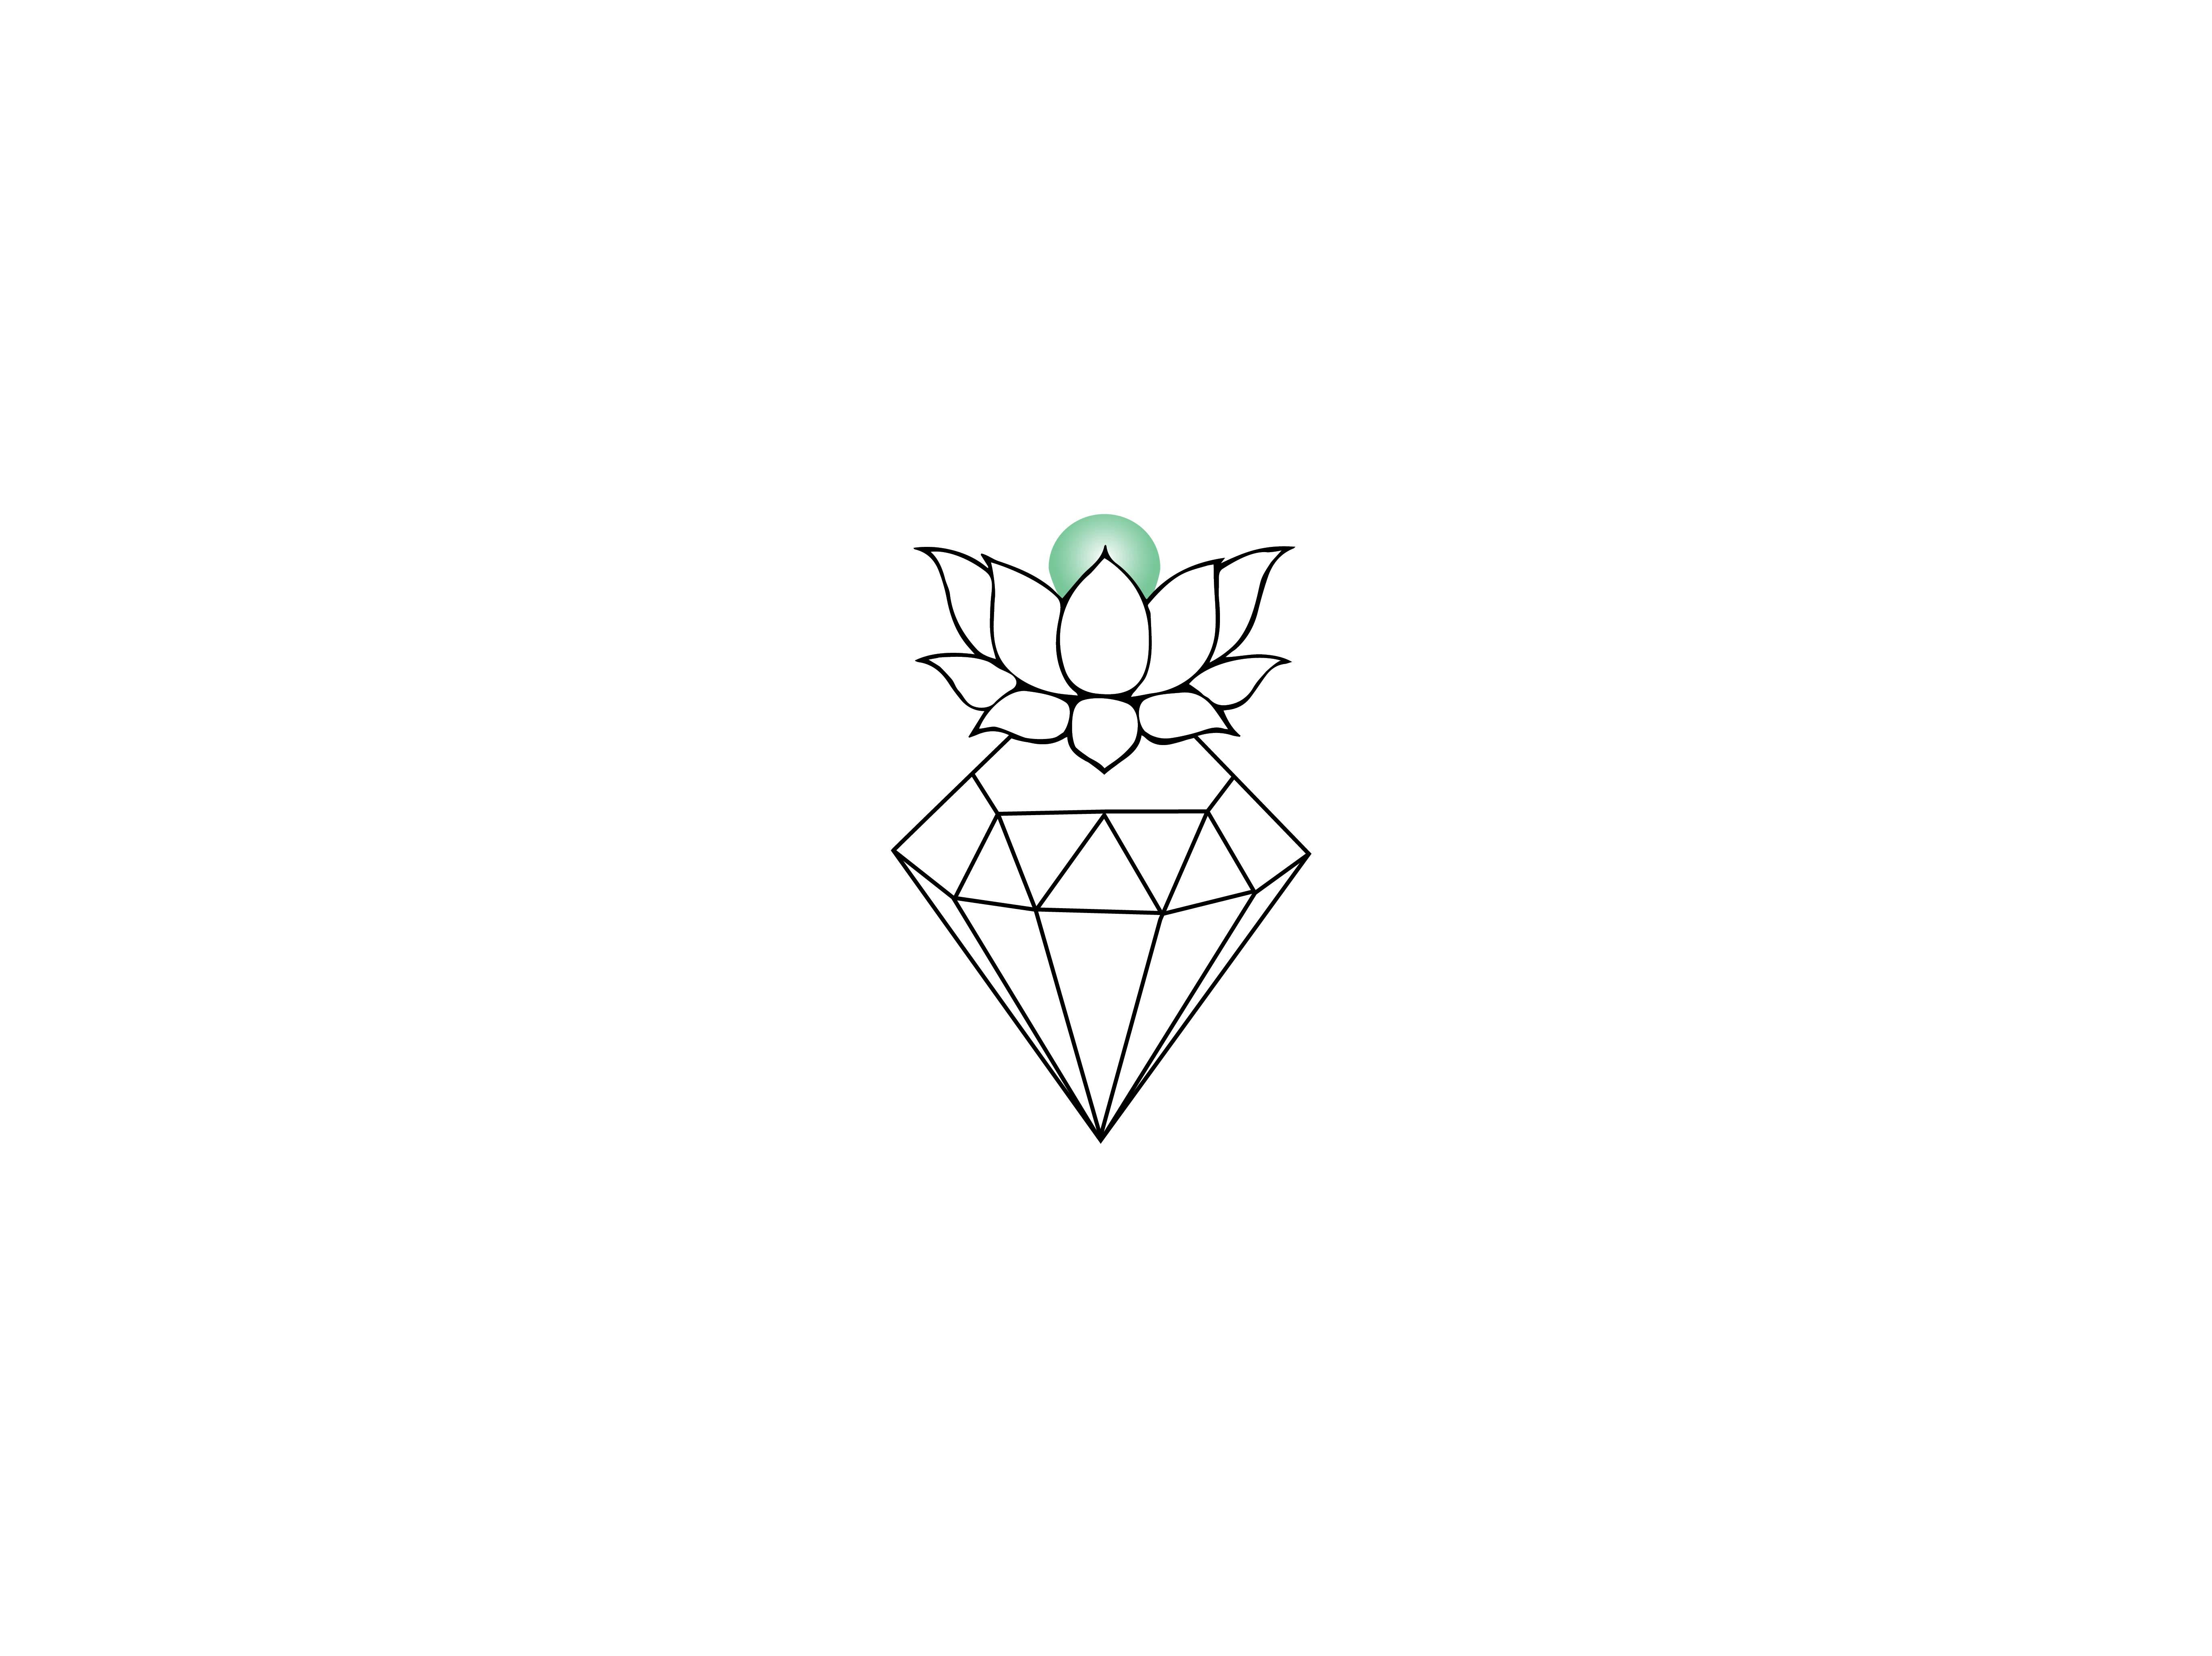 donnee_logo_001-01